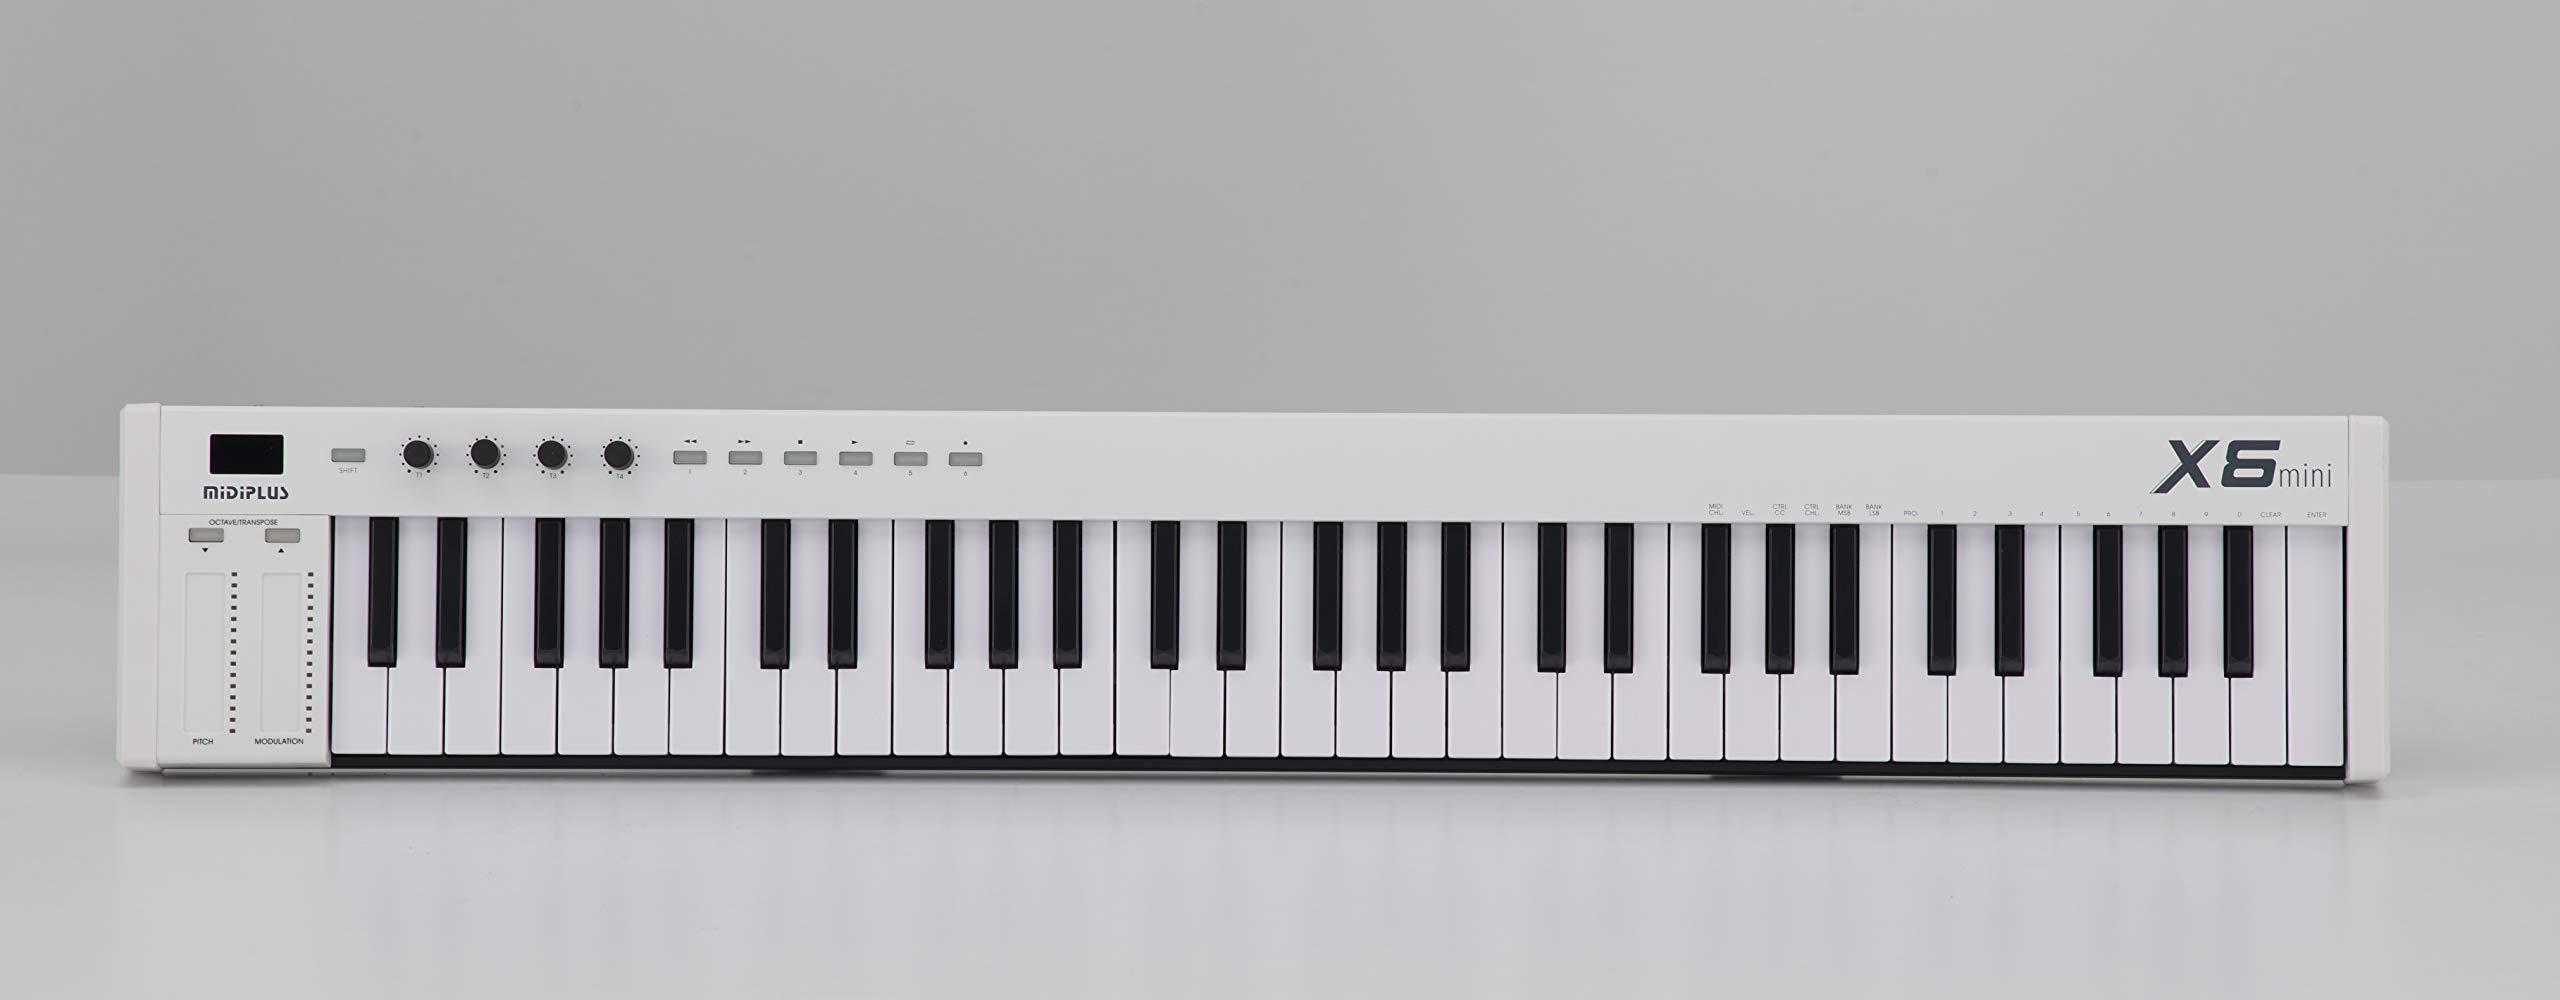 midiplus MIDI Keyboard Controller, (X6 mini) by Midiplus